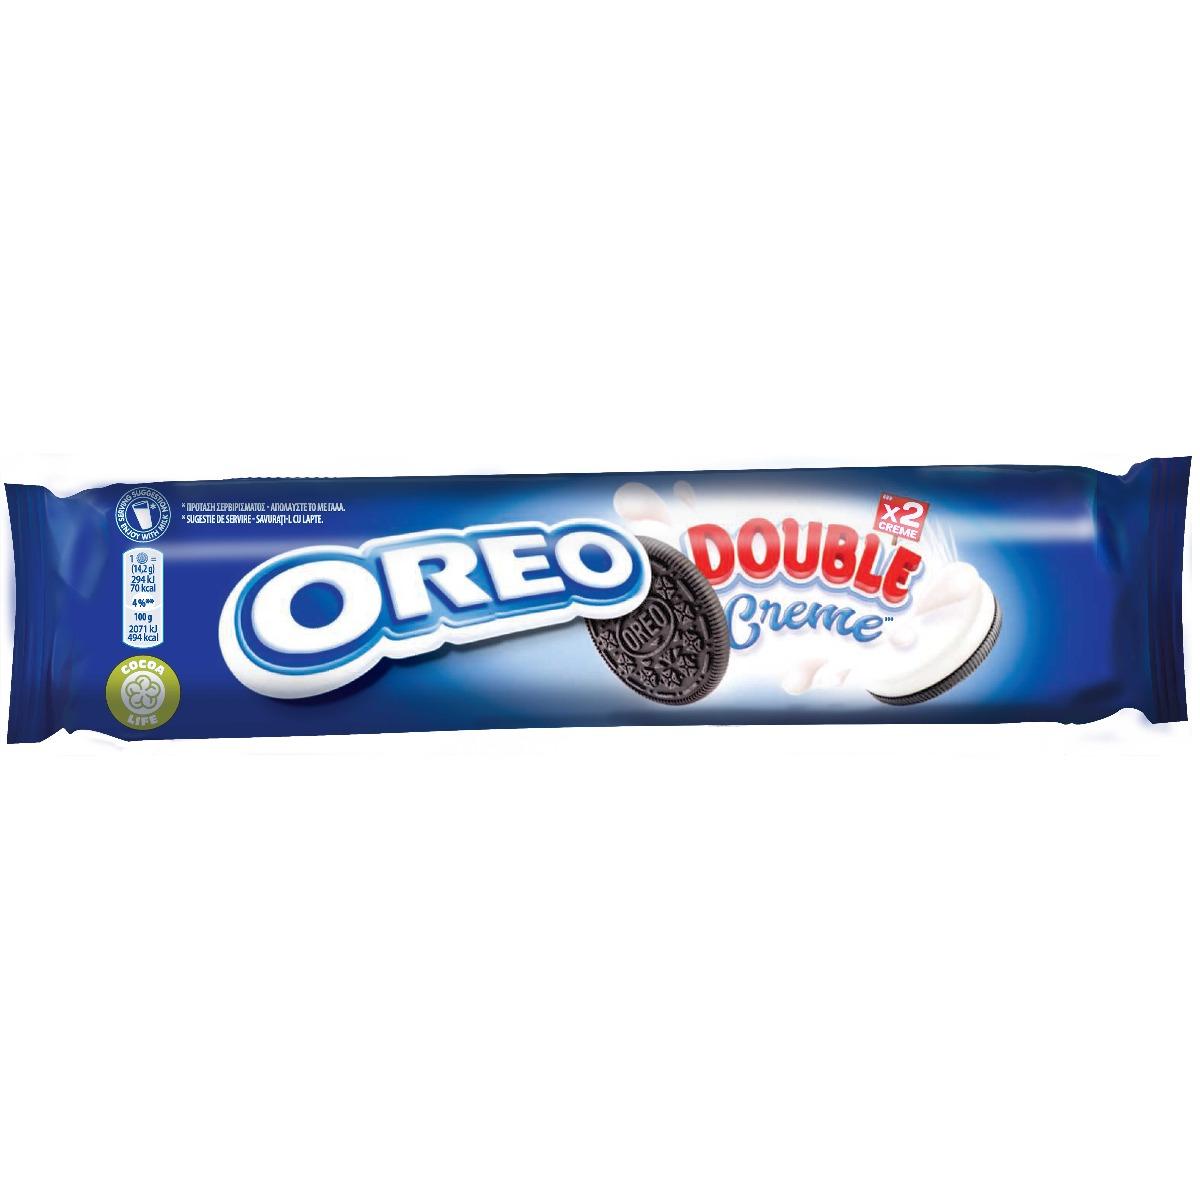 Biscuiti cu cacao si crema de vanilie Oreo Double Cream, 185 g imagine